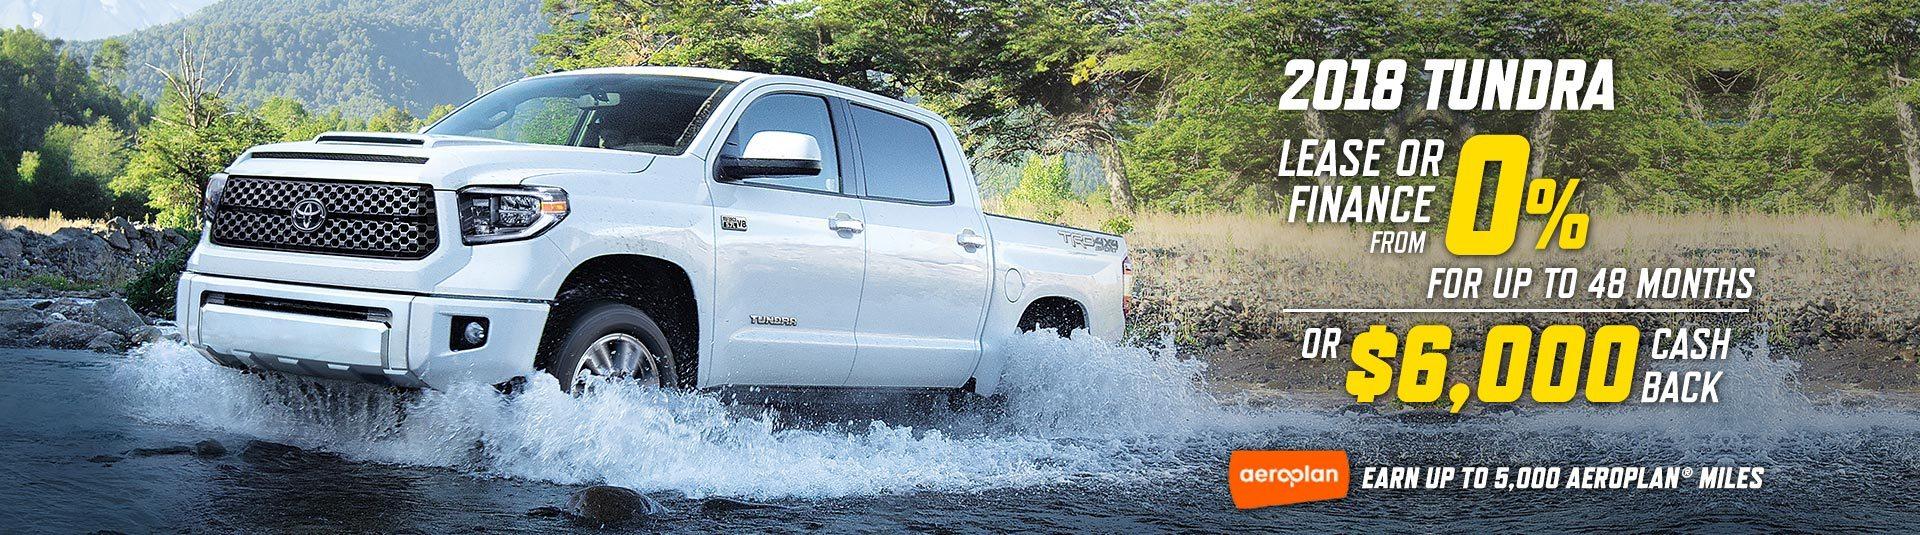 2018 Toyota Tundra Offer